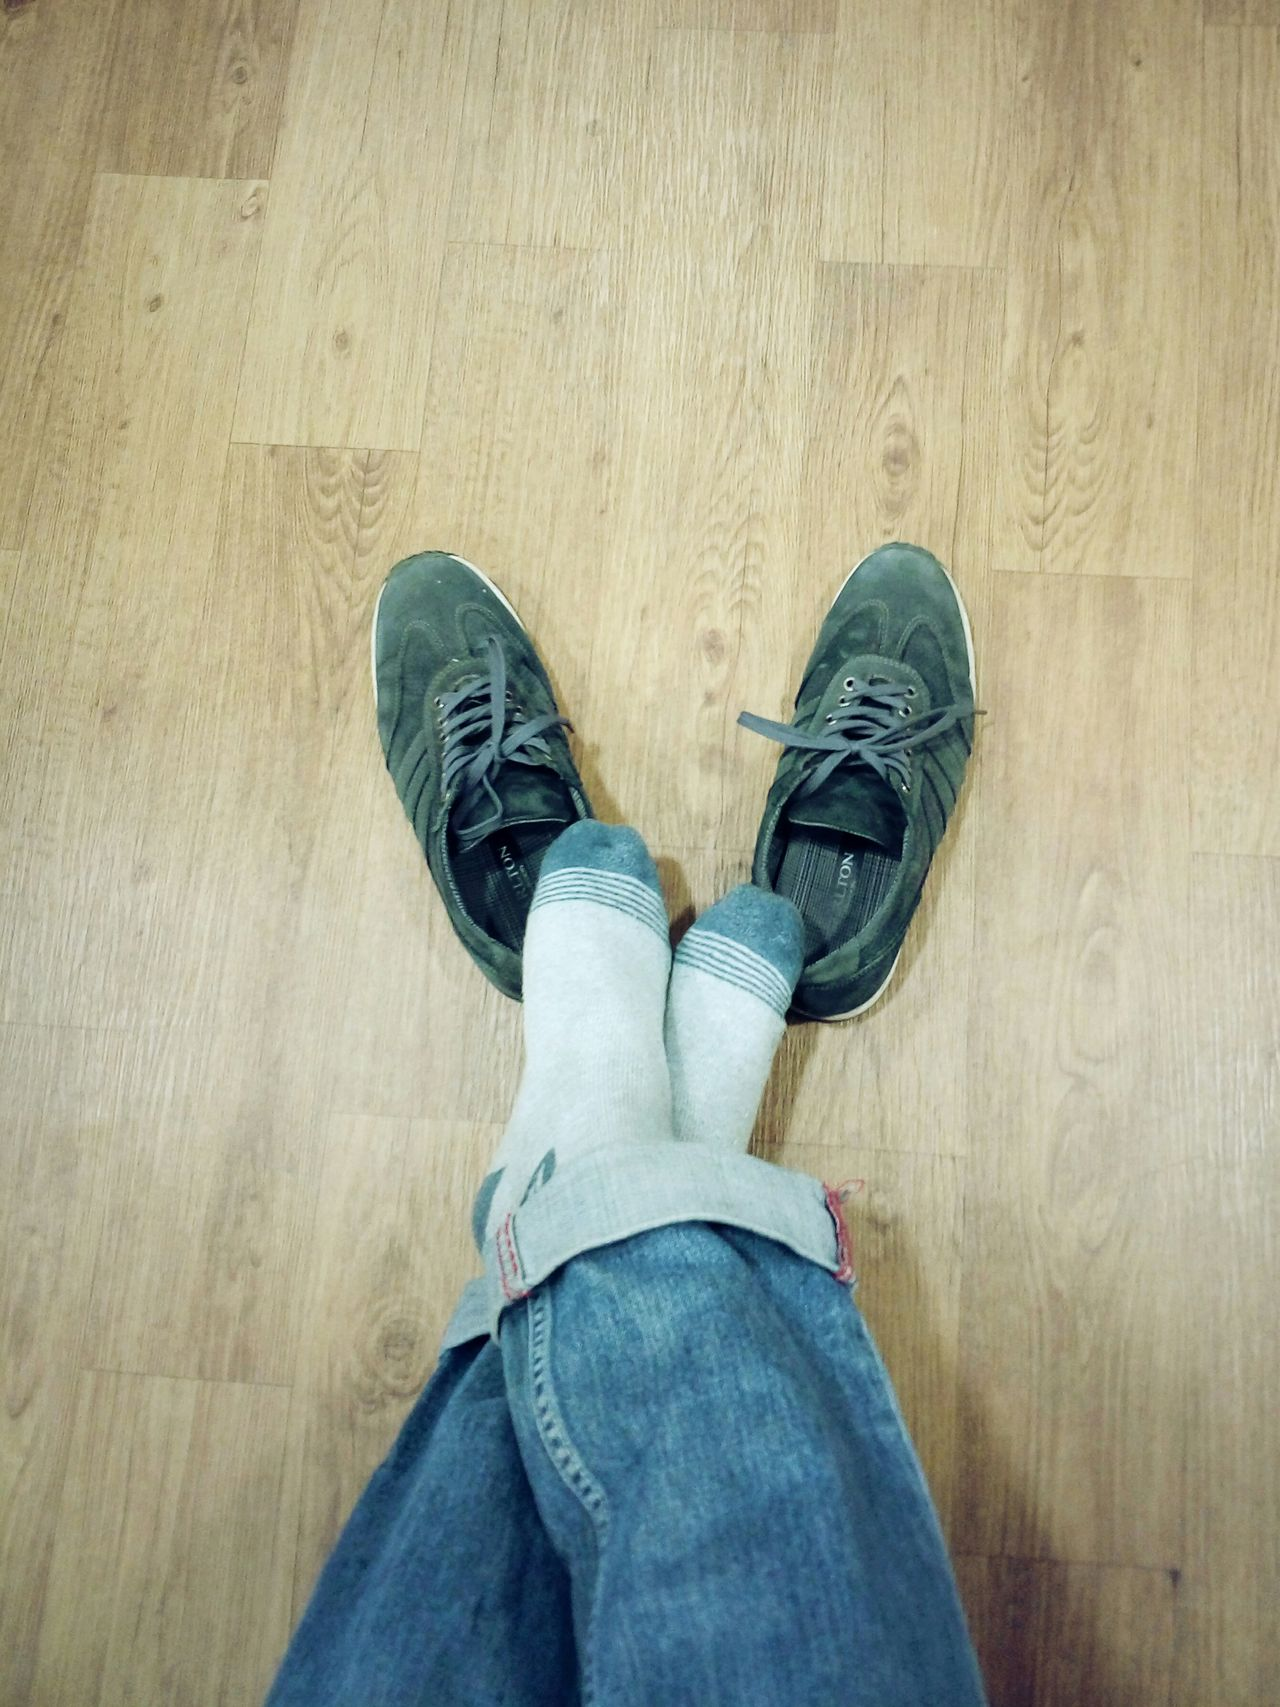 TK Maxx Socksie Human Leg Shoe Jeans Lifestyles Socks relax Mumbai India